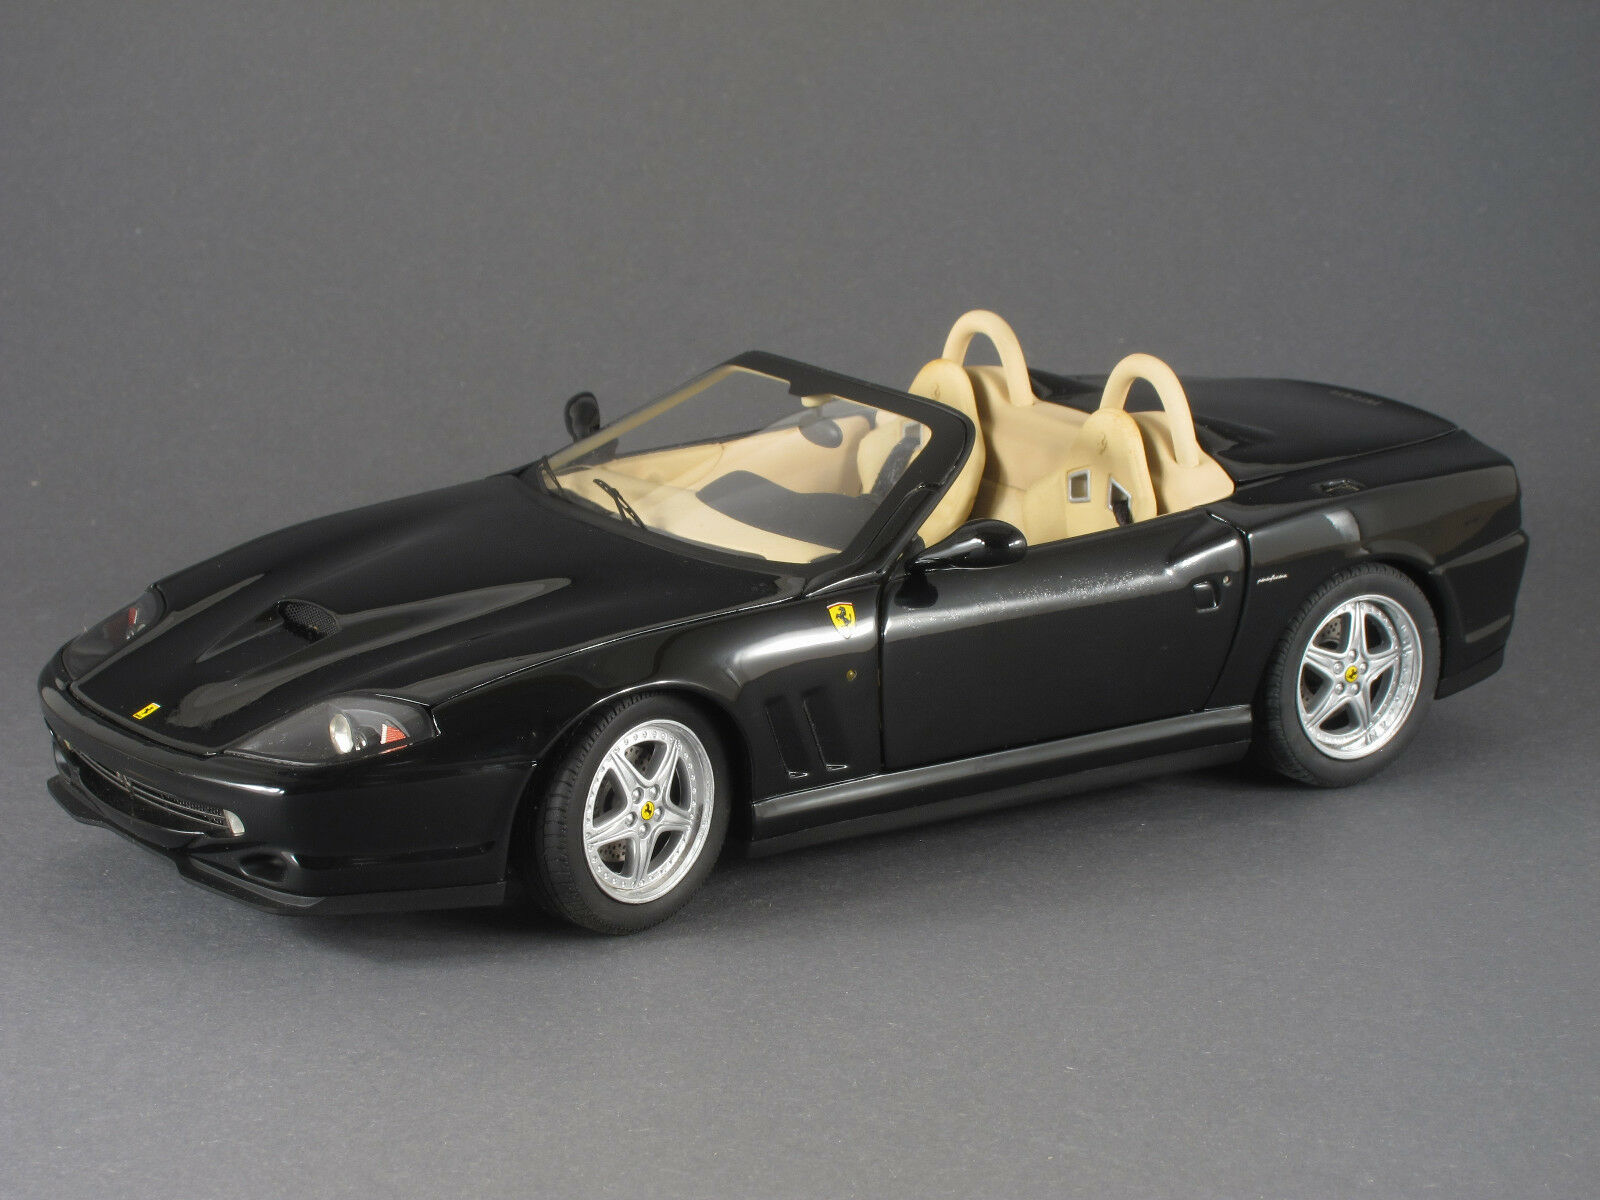 1 18 Hot Wheels Elite Ferrari 550 Barchetta Pininfarina 2000 - black - 141727